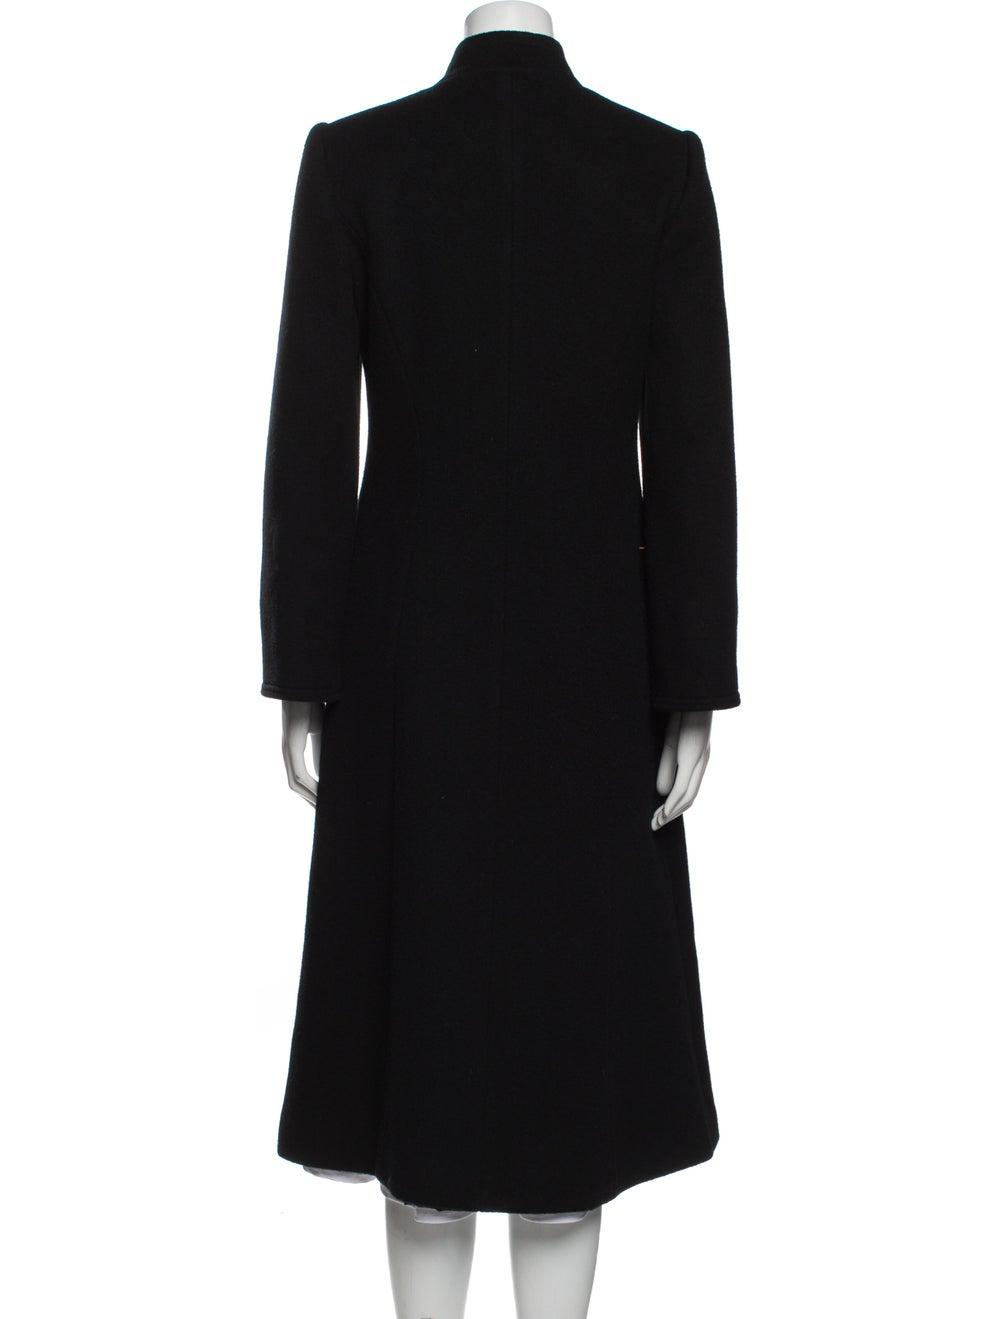 Pauline Trigere Coat Black - image 3